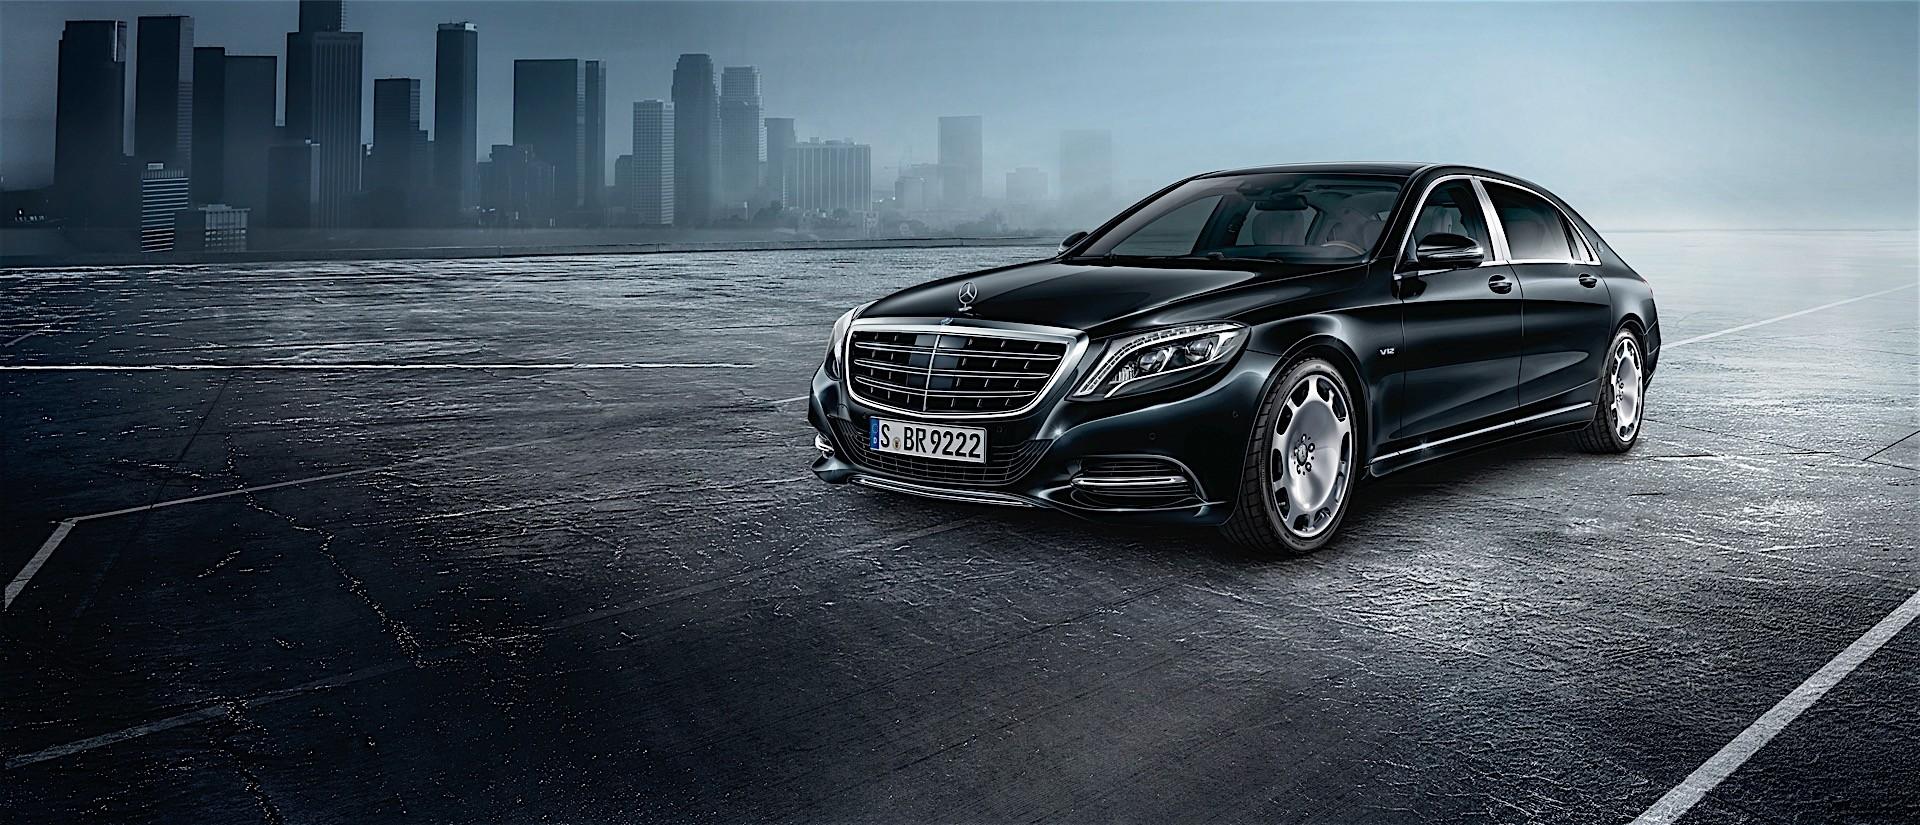 Plug In Hybrid Cars >> Mercedes-Maybach S600 Guard: 470,000 Euros of Bulletproof ...